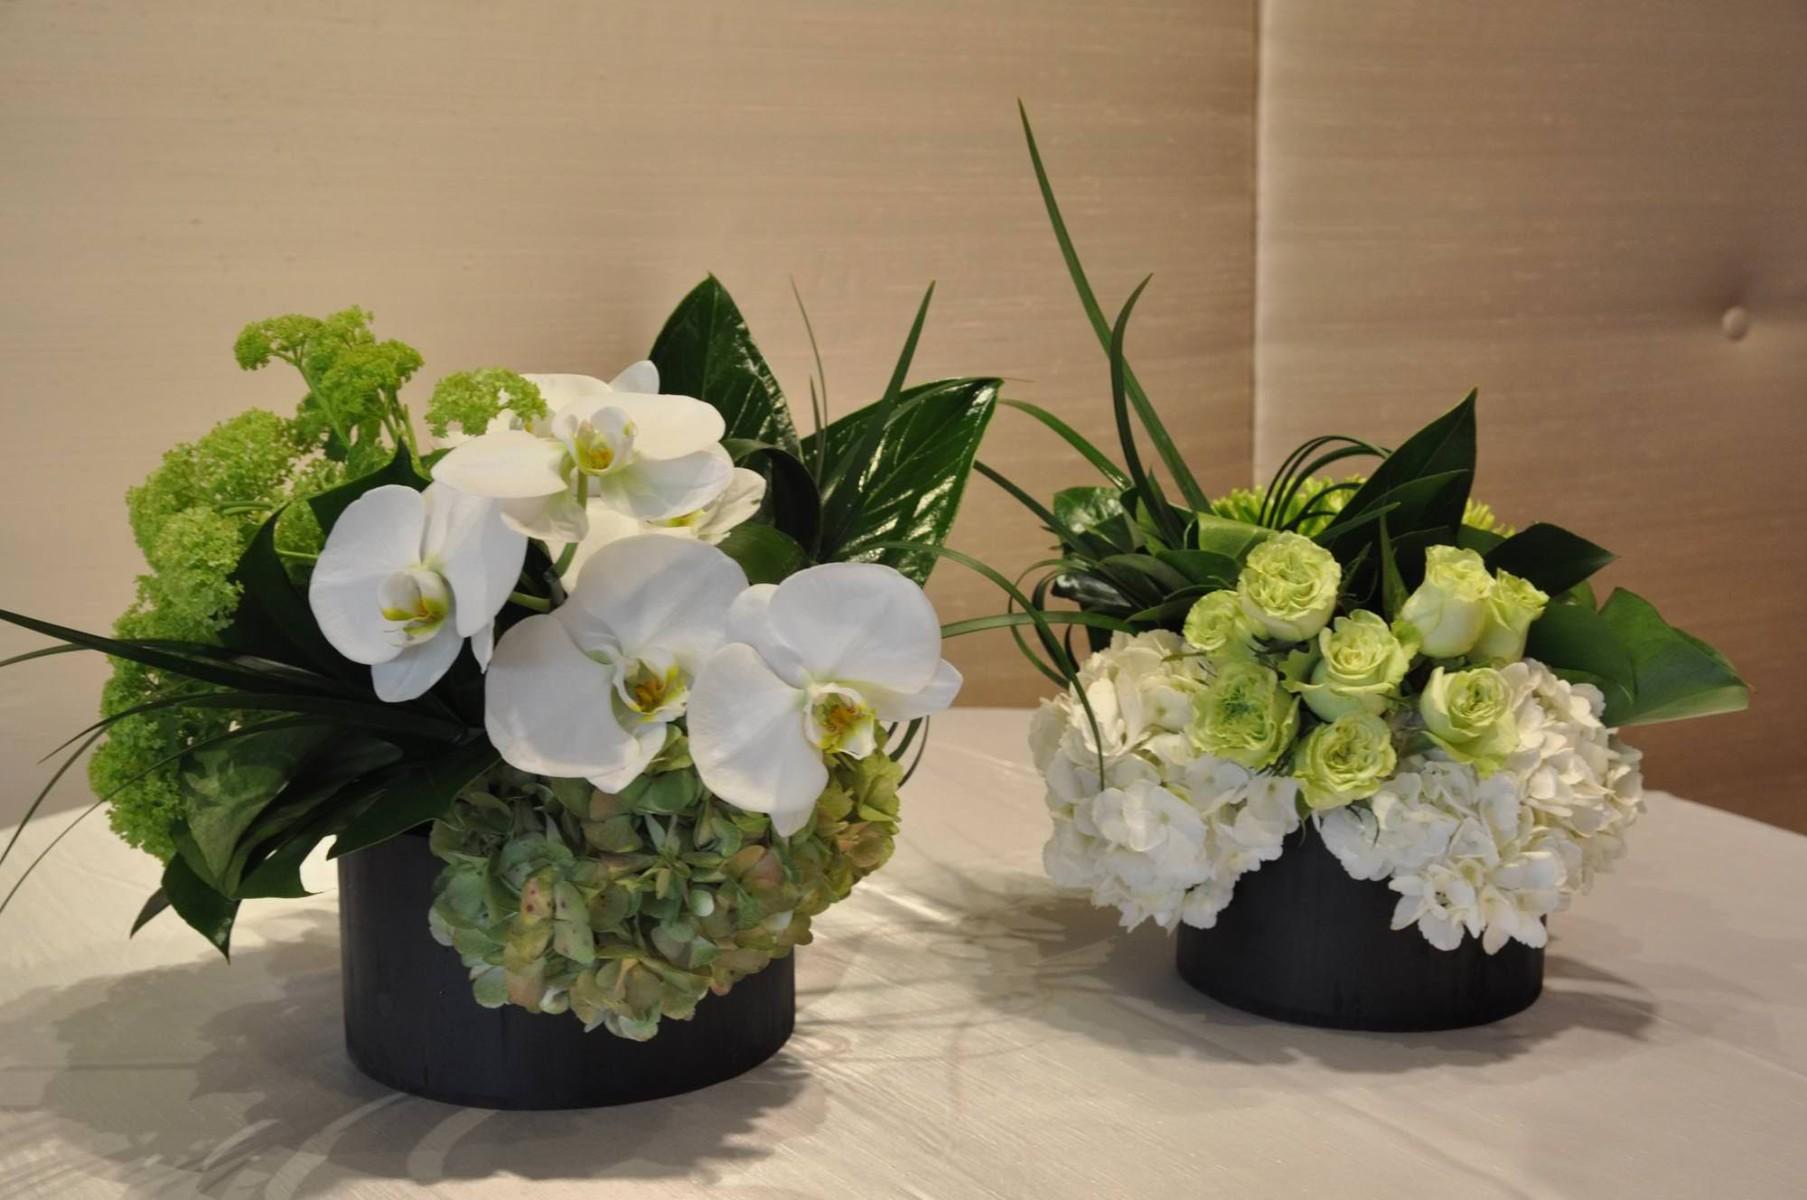 nisies-enchanted-florist-orange-county-floral-arrangments-22